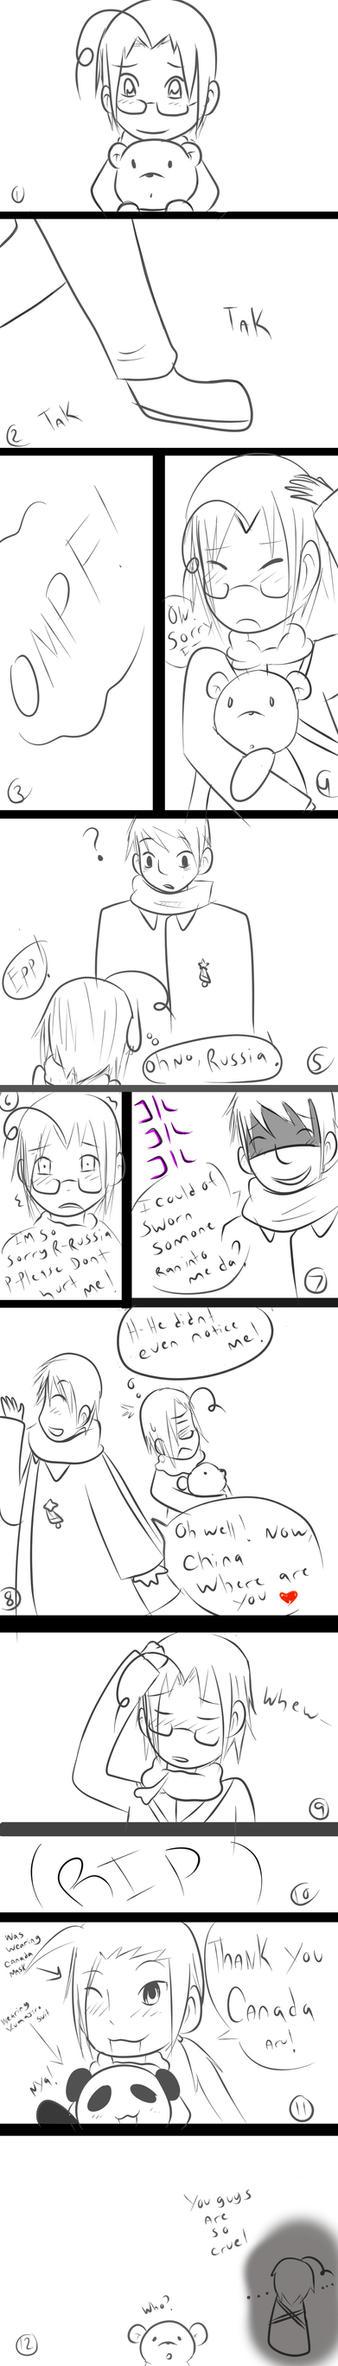 April fools by Shino-Love-Bug248